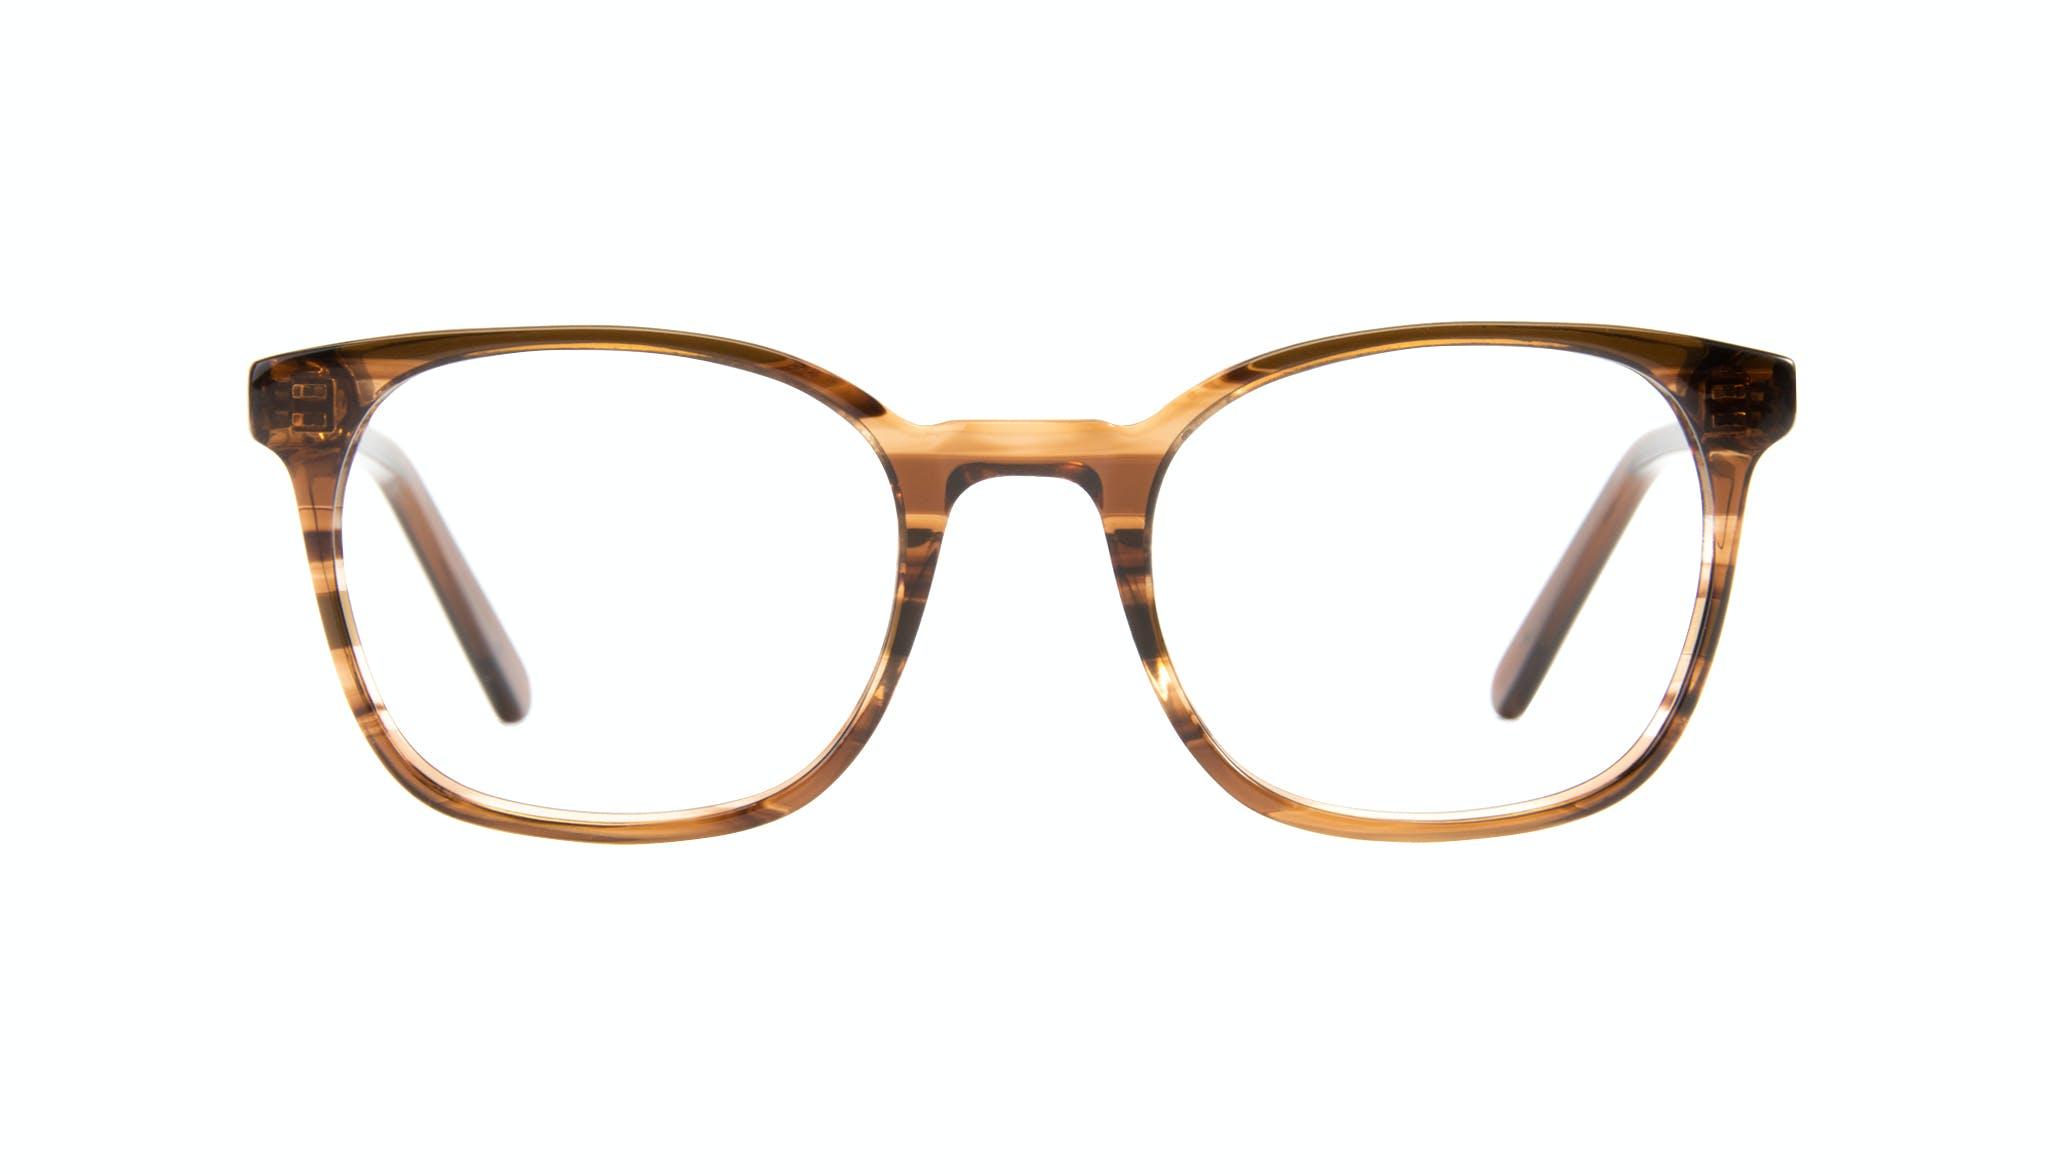 Affordable Fashion Glasses Rectangle Square Eyeglasses Men Peak Wood Front